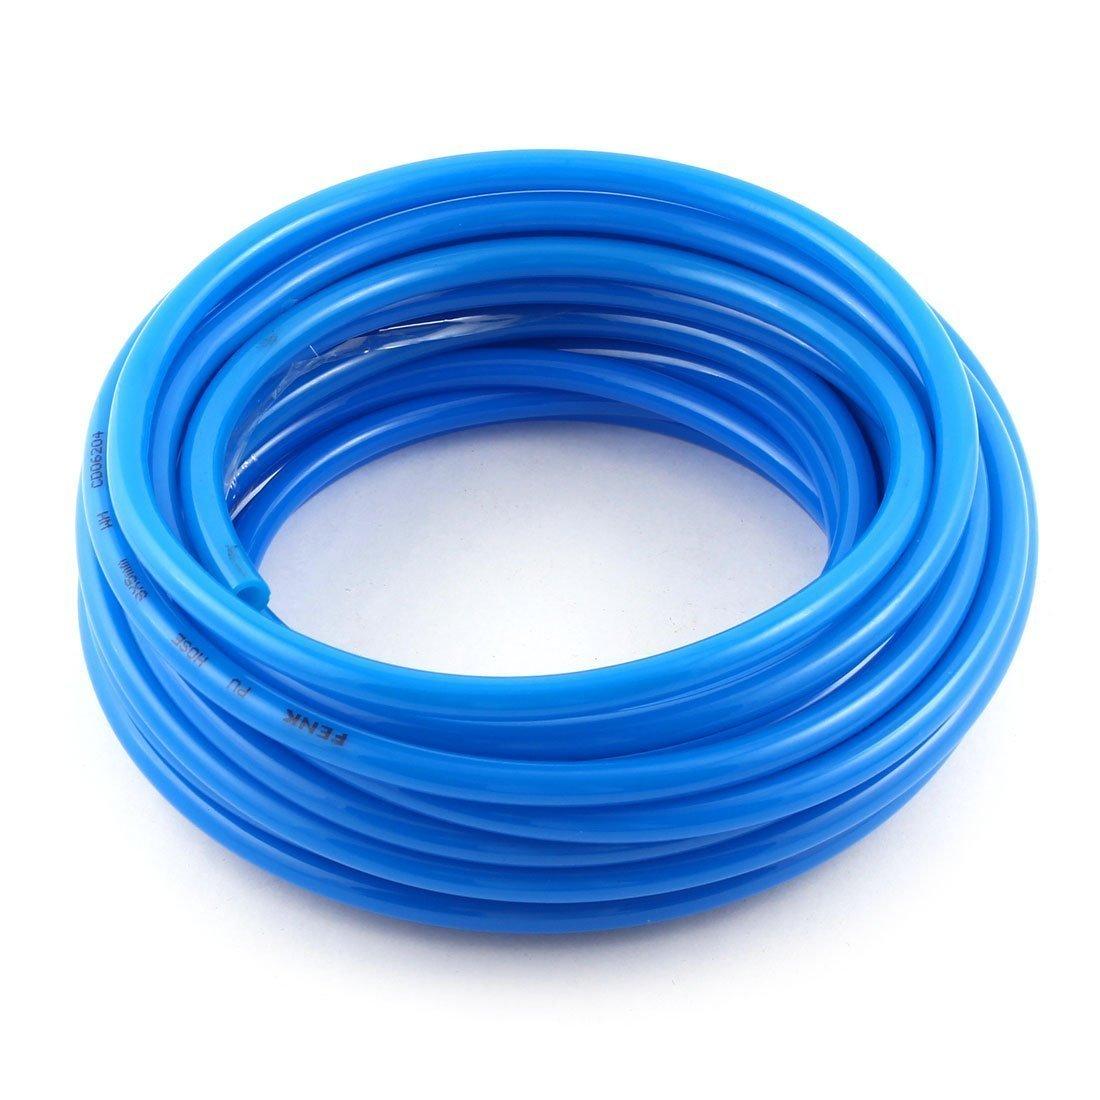 Manguera tubo tuberia de aire de PU - SODIAL(R)8mm(OD) x 5mm(ID) Manguera tubo tuberia de aire de PU 10 Metros Azul 10M